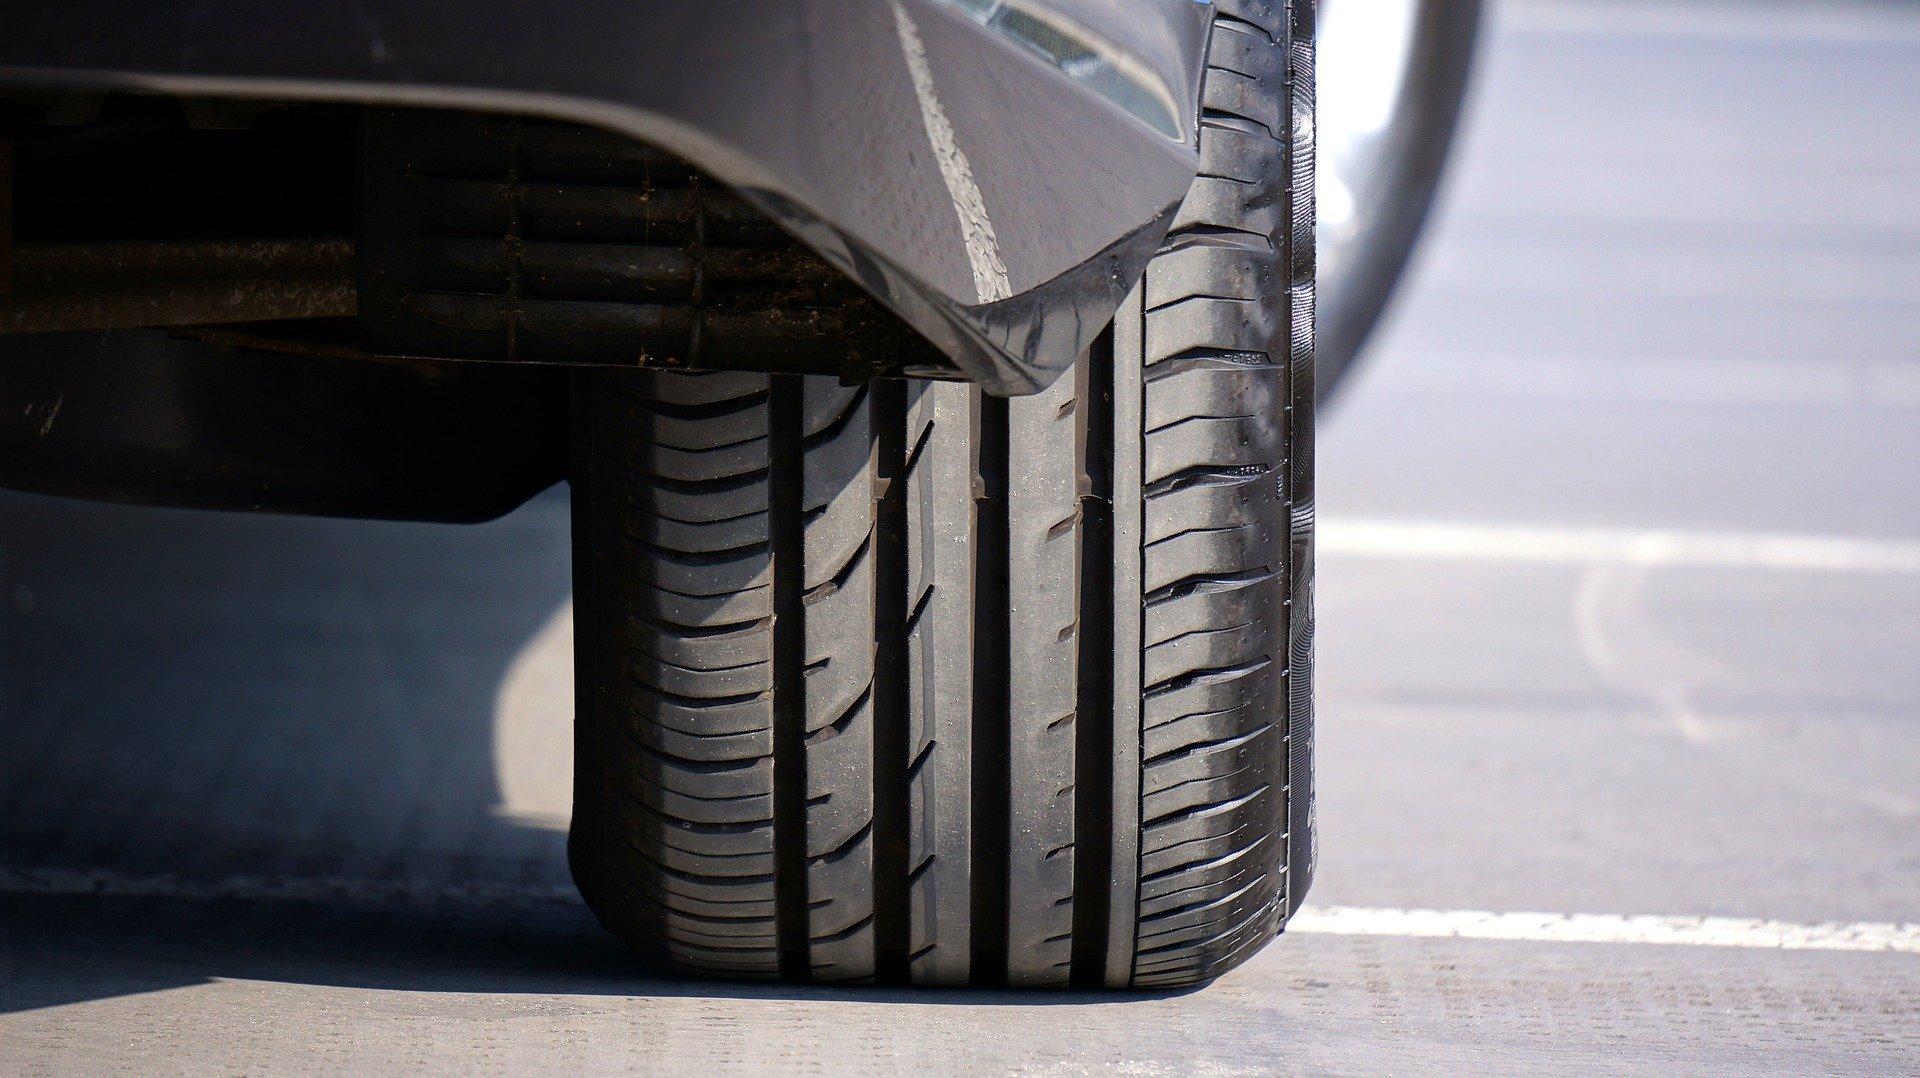 Asda Tyre Discount Code